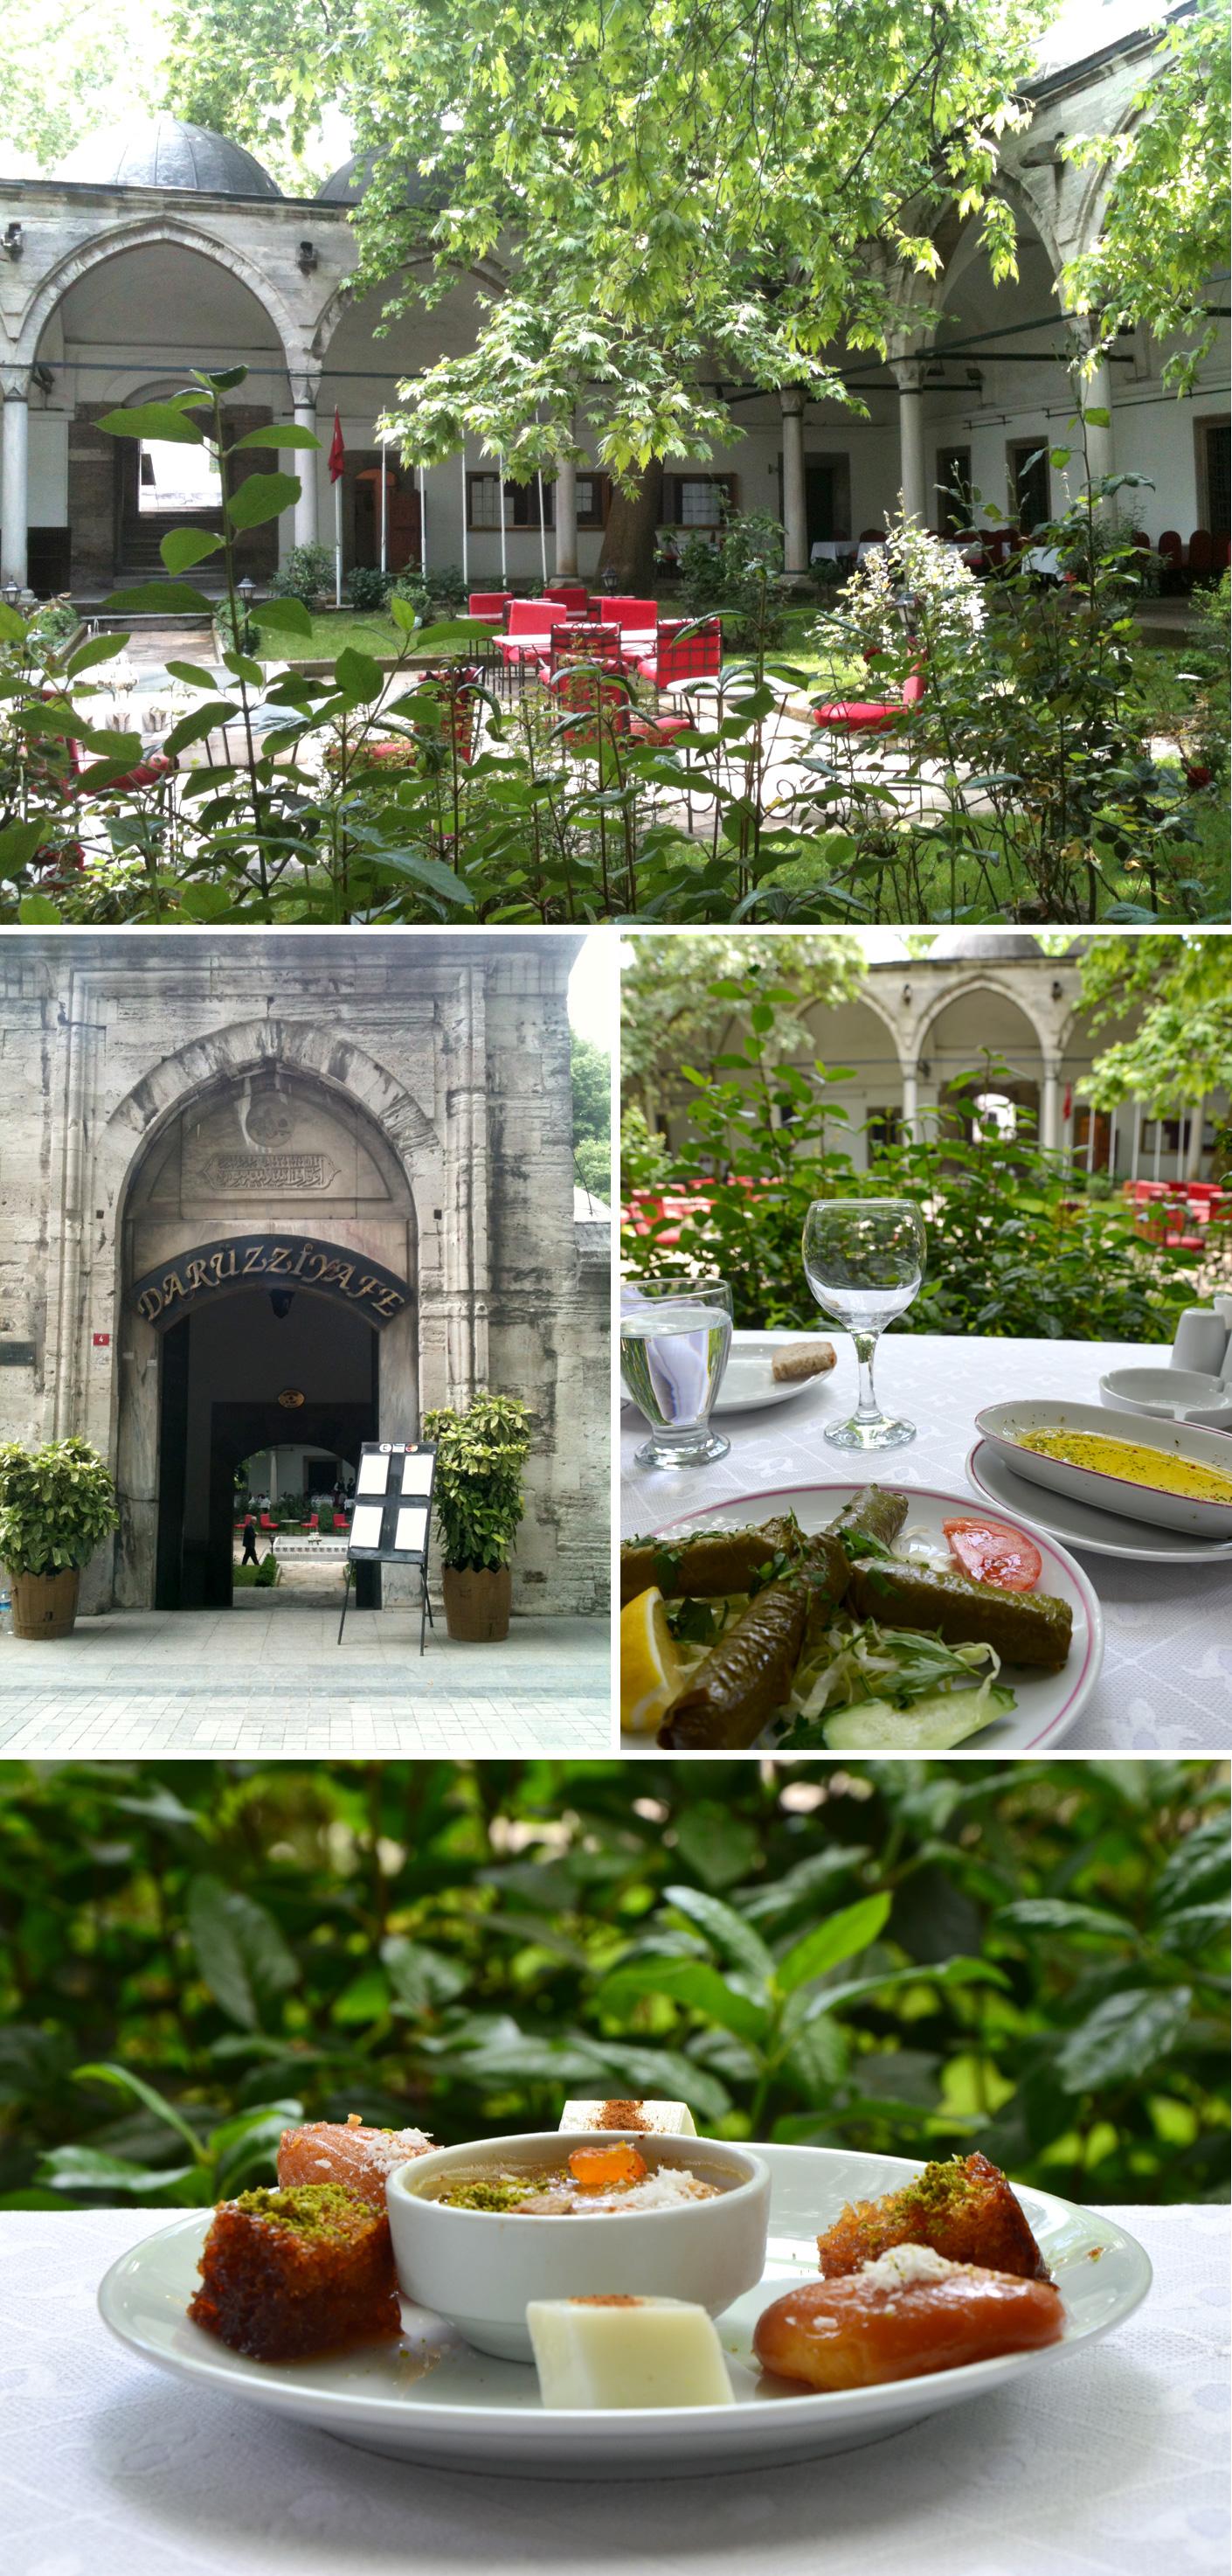 Daruzziyafe-Istanbul